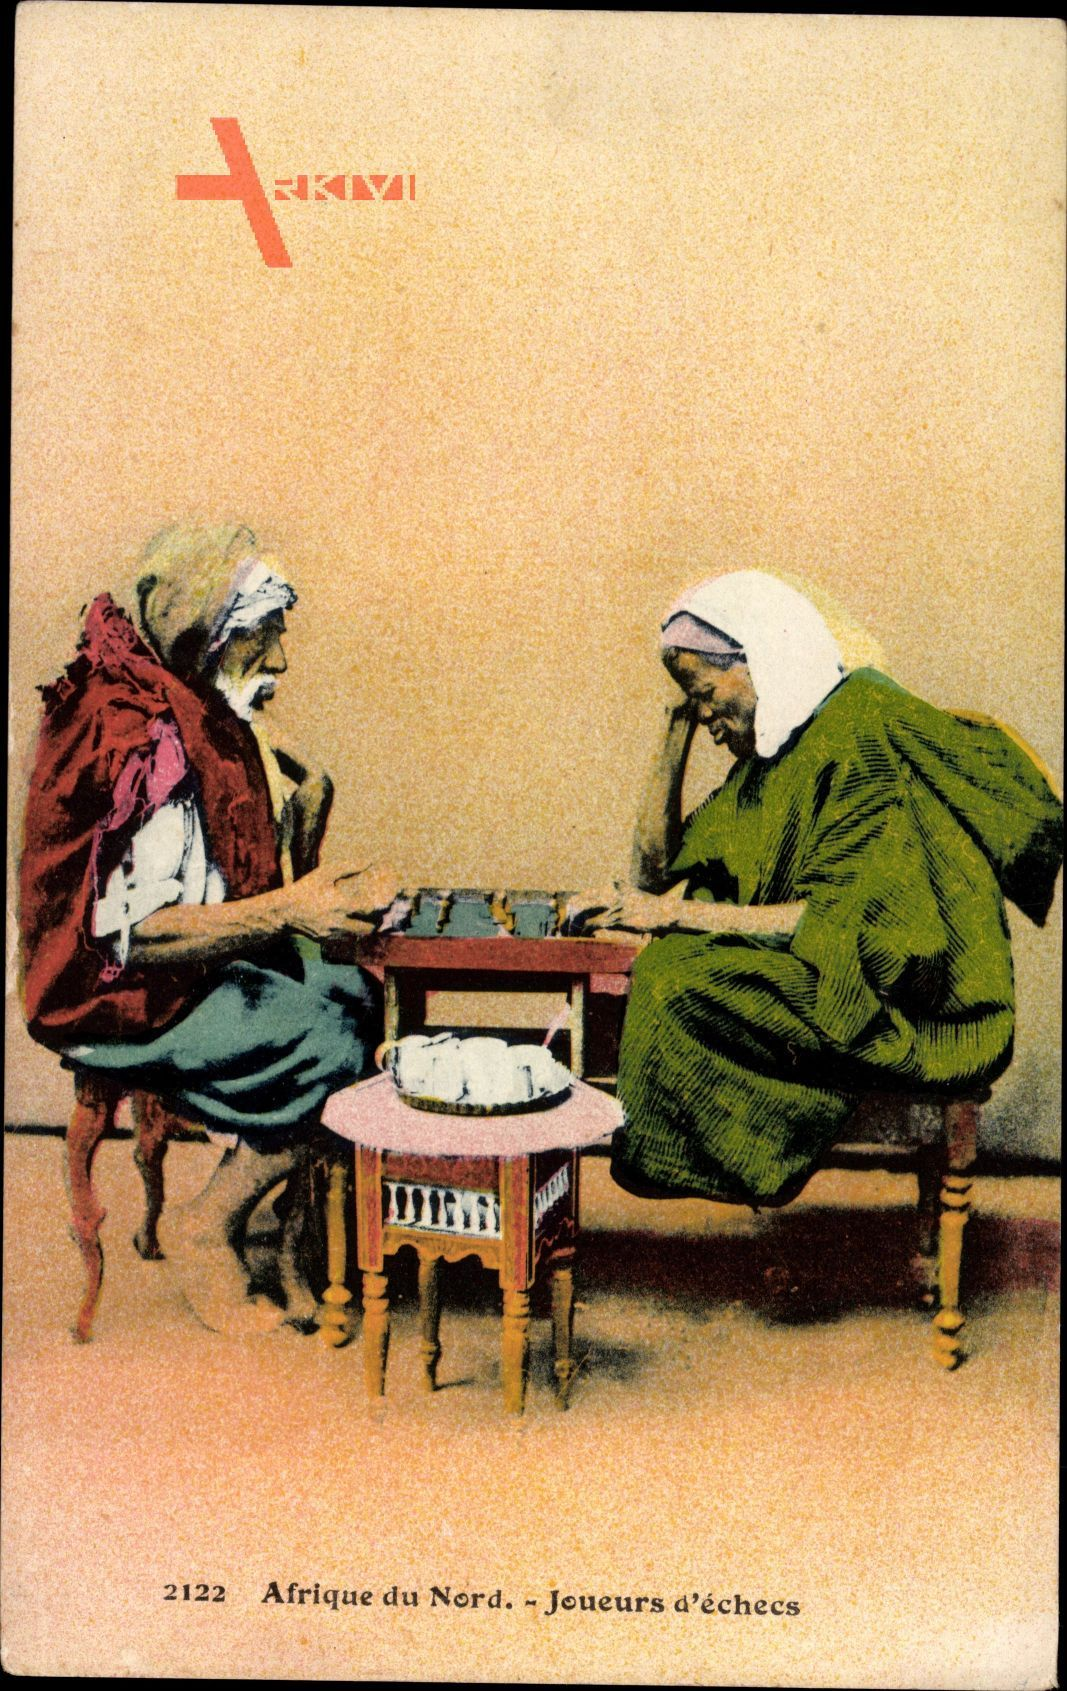 Afrique du Nord, Joueurs déchecs, Arabische Schachspieler